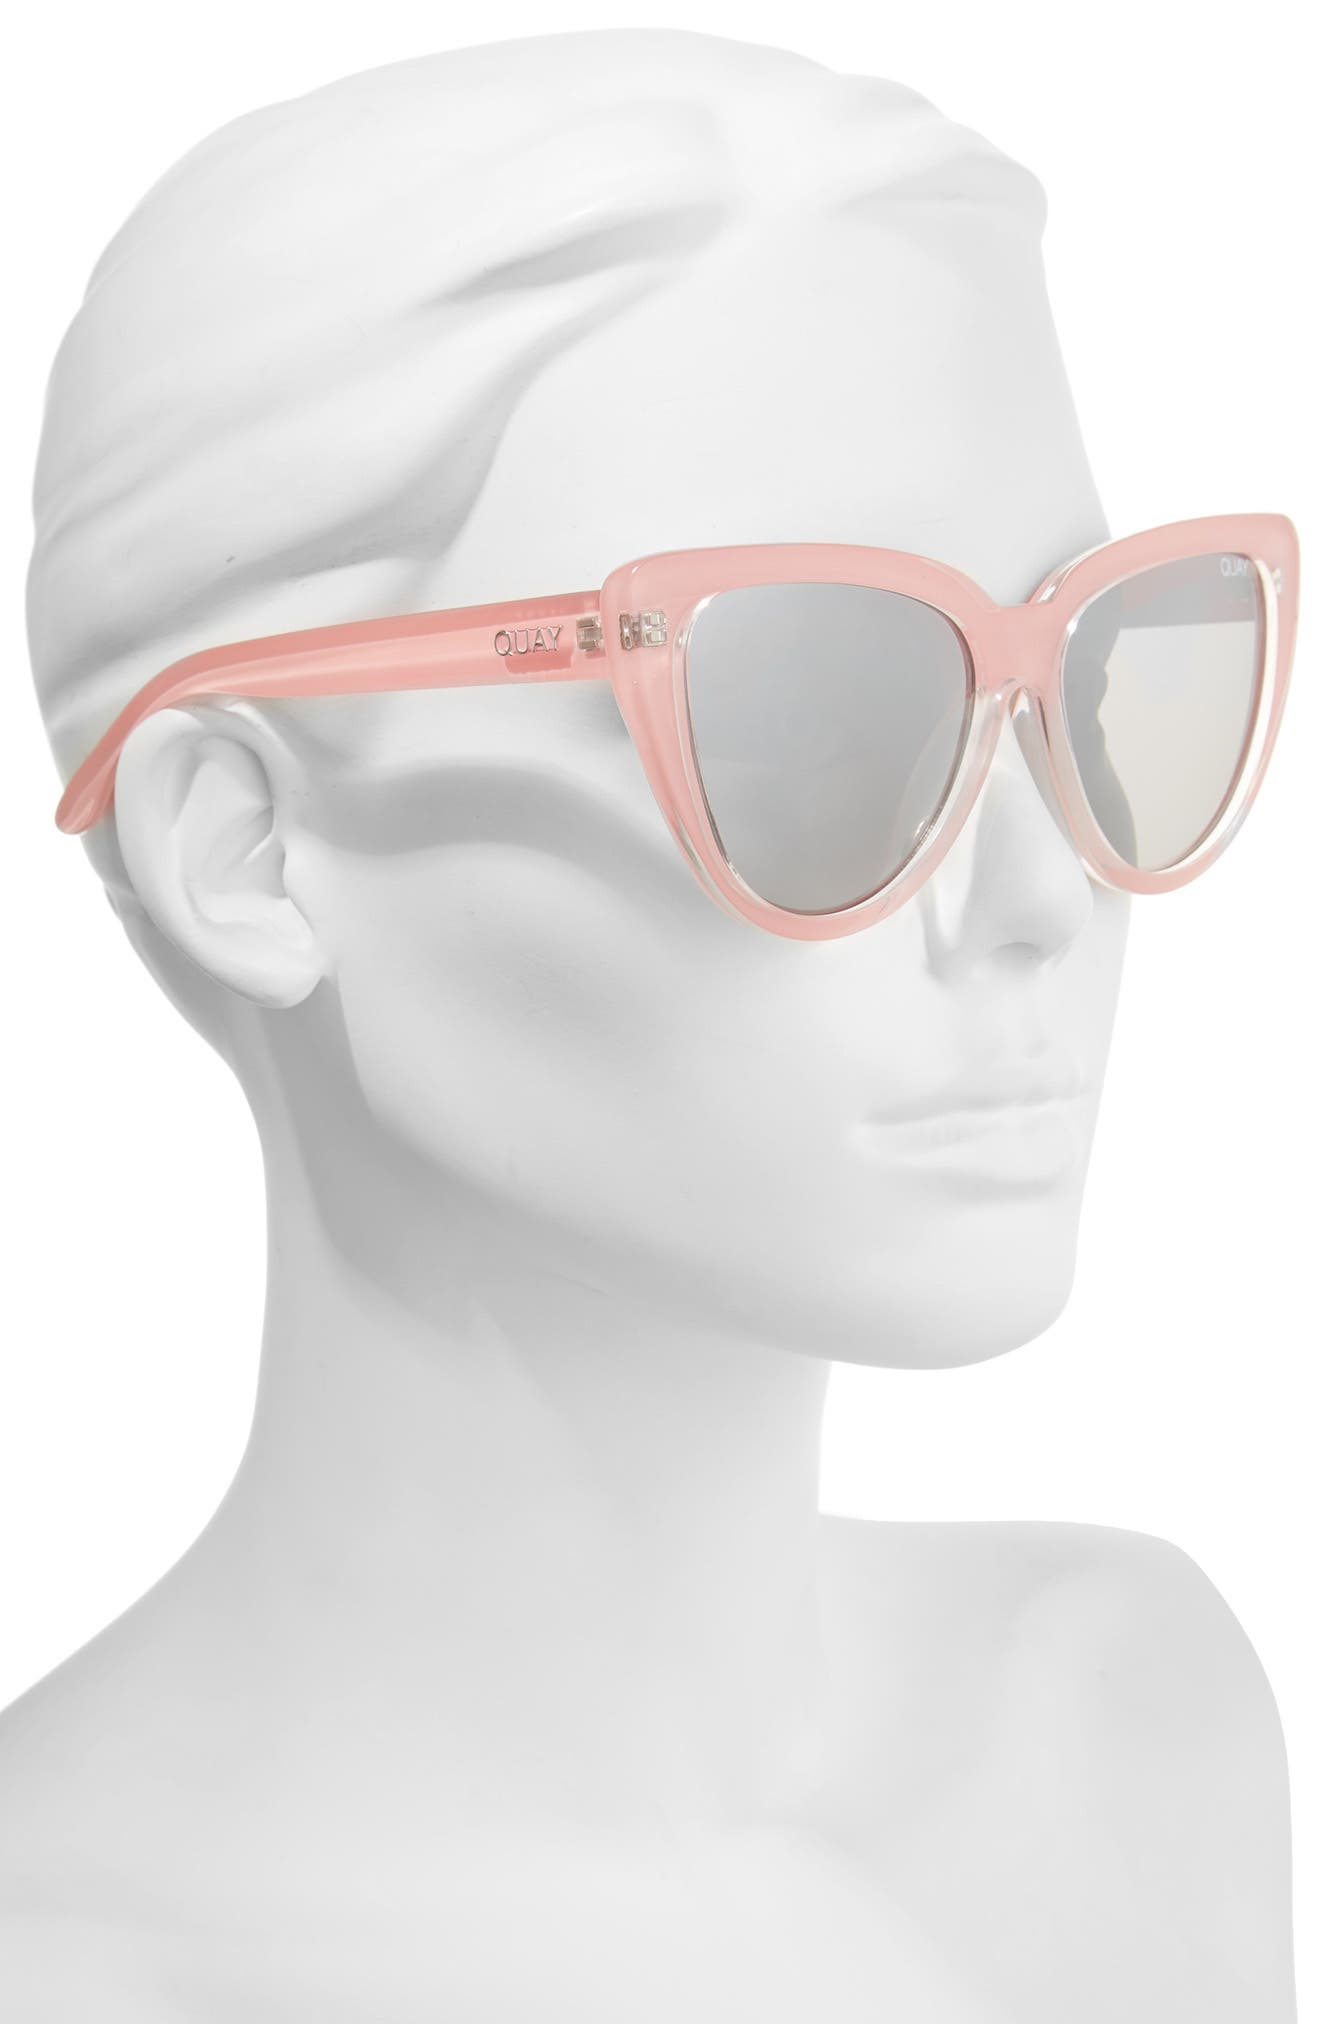 Stray Cat 58mm Mirrored Cat Eye Sunglasses,                             Alternate thumbnail 2, color,                             Peach/ Gradual Flash Mirror